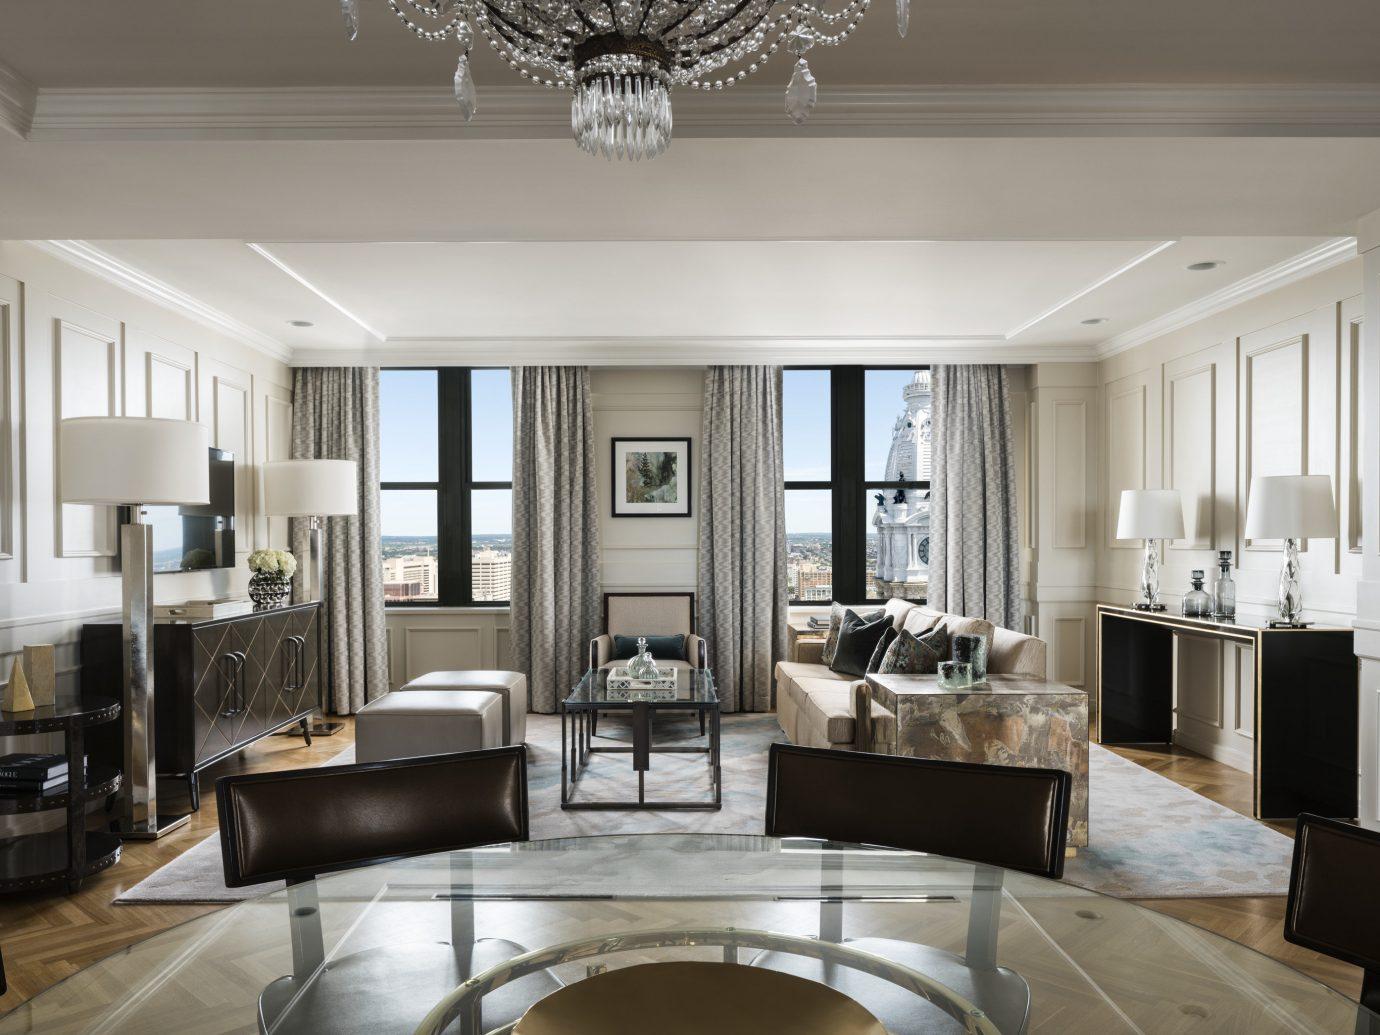 Boutique Hotels Hotels Philadelphia indoor ceiling window floor wall room Living living room interior design furniture interior designer flooring area Modern Island several